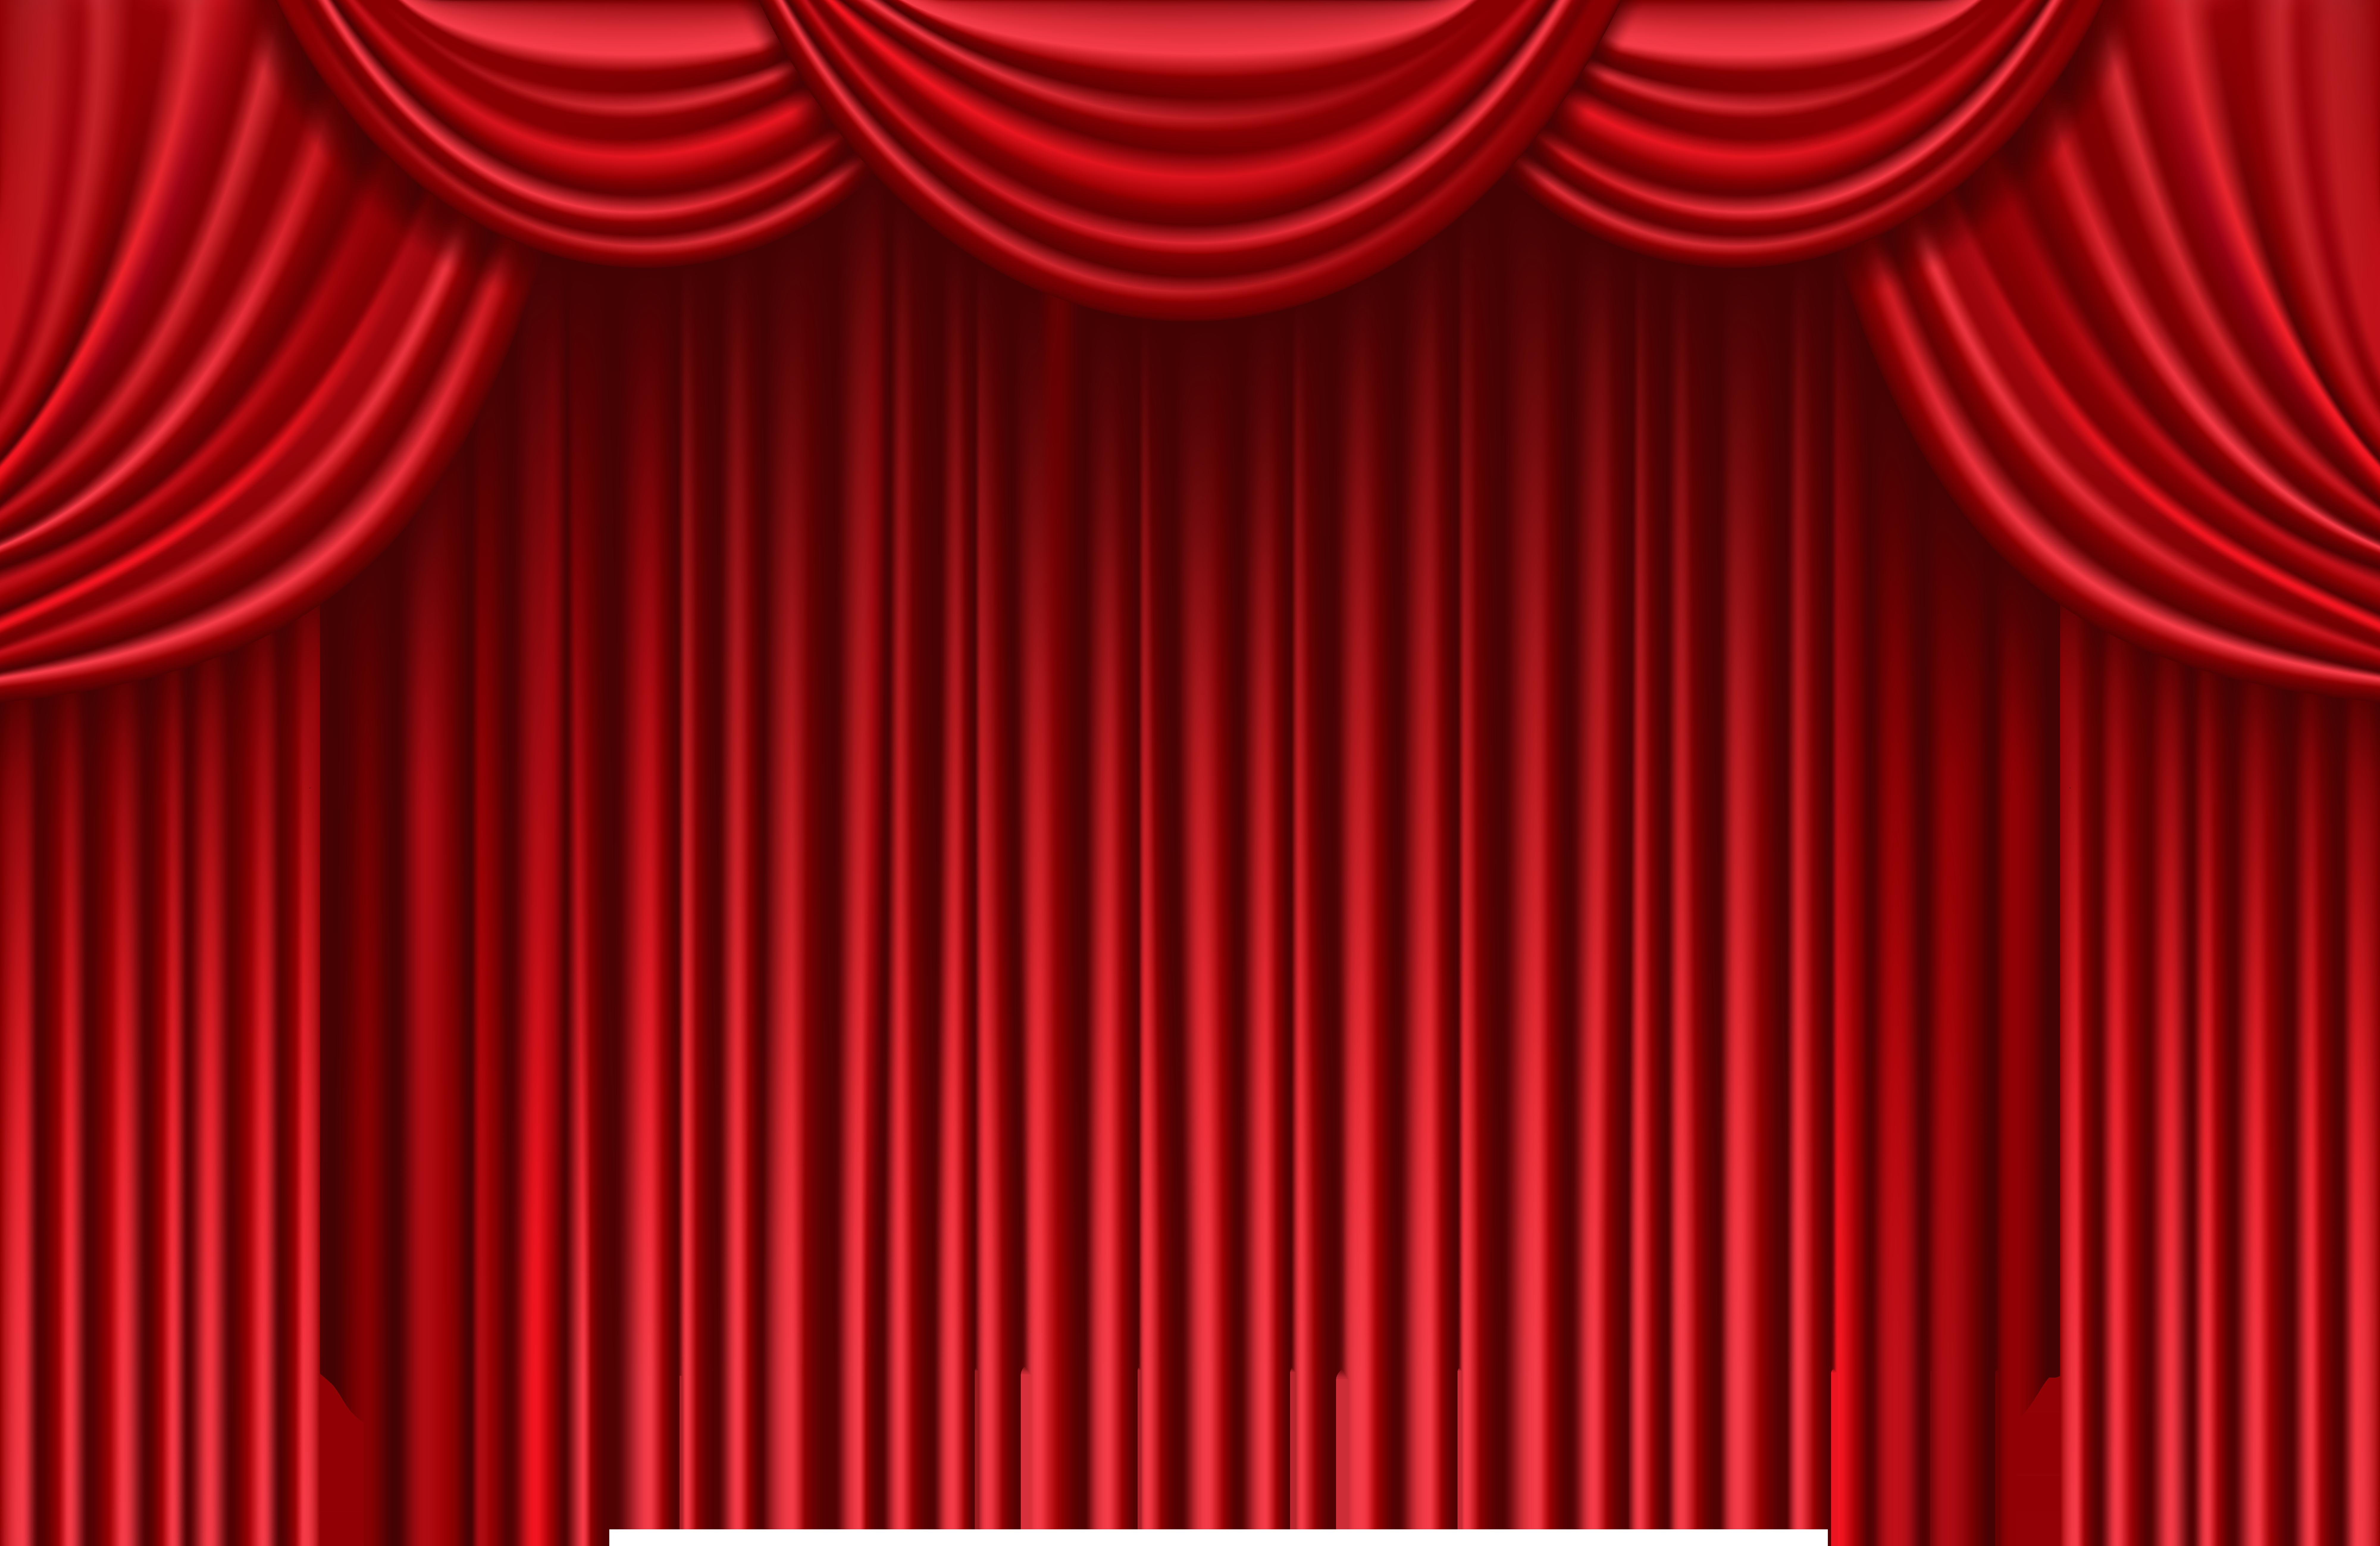 Curtains clipart theatre. Pin by markku hapulahti